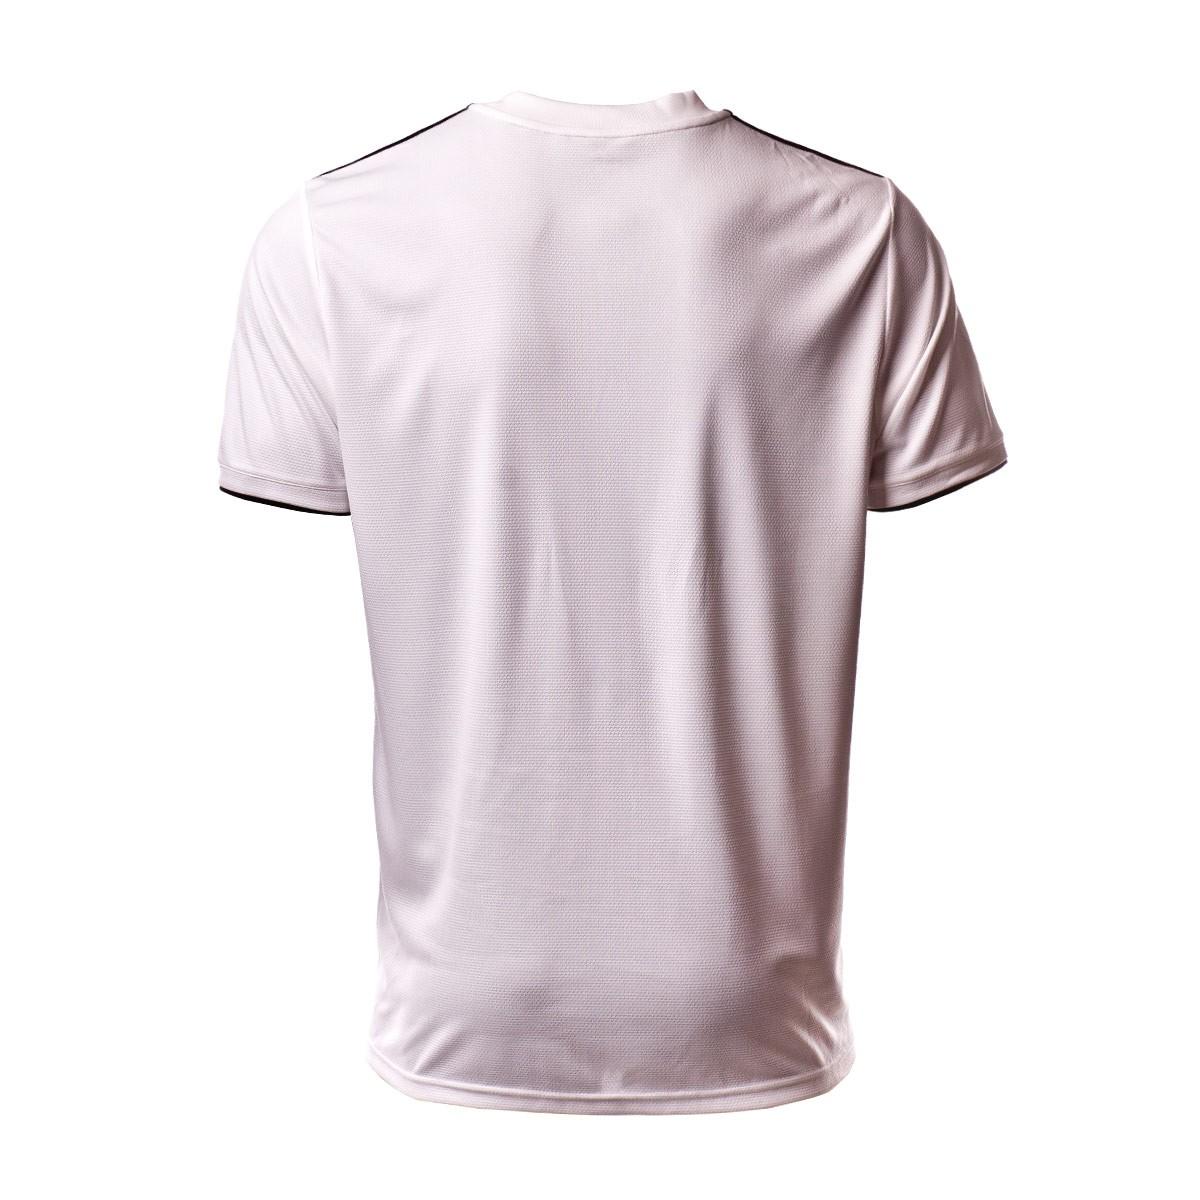 da1d4a460 Jersey adidas Real Madrid LFP 2018-2019 Home White-black - Football ...